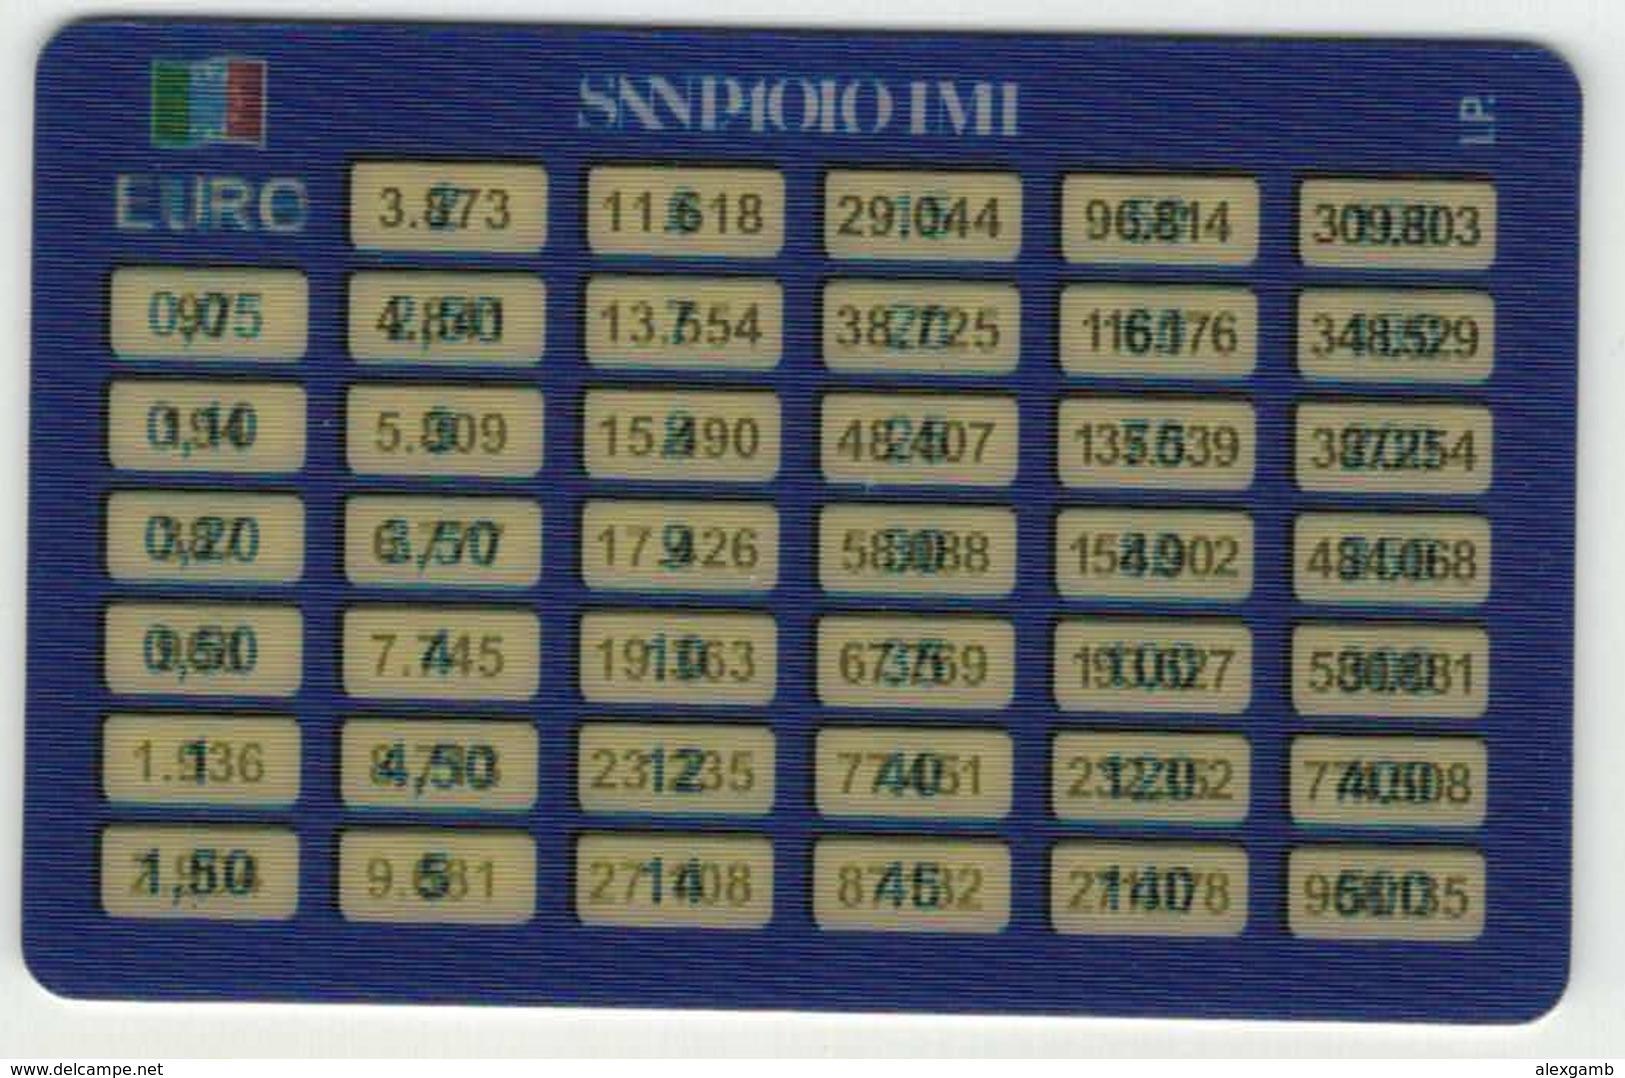 BANCA SANPAOLO - CONVERTITORE LIRE EURO - BENVENUTO EURO - RARO - Geldkarten (Ablauf Min. 10 Jahre)